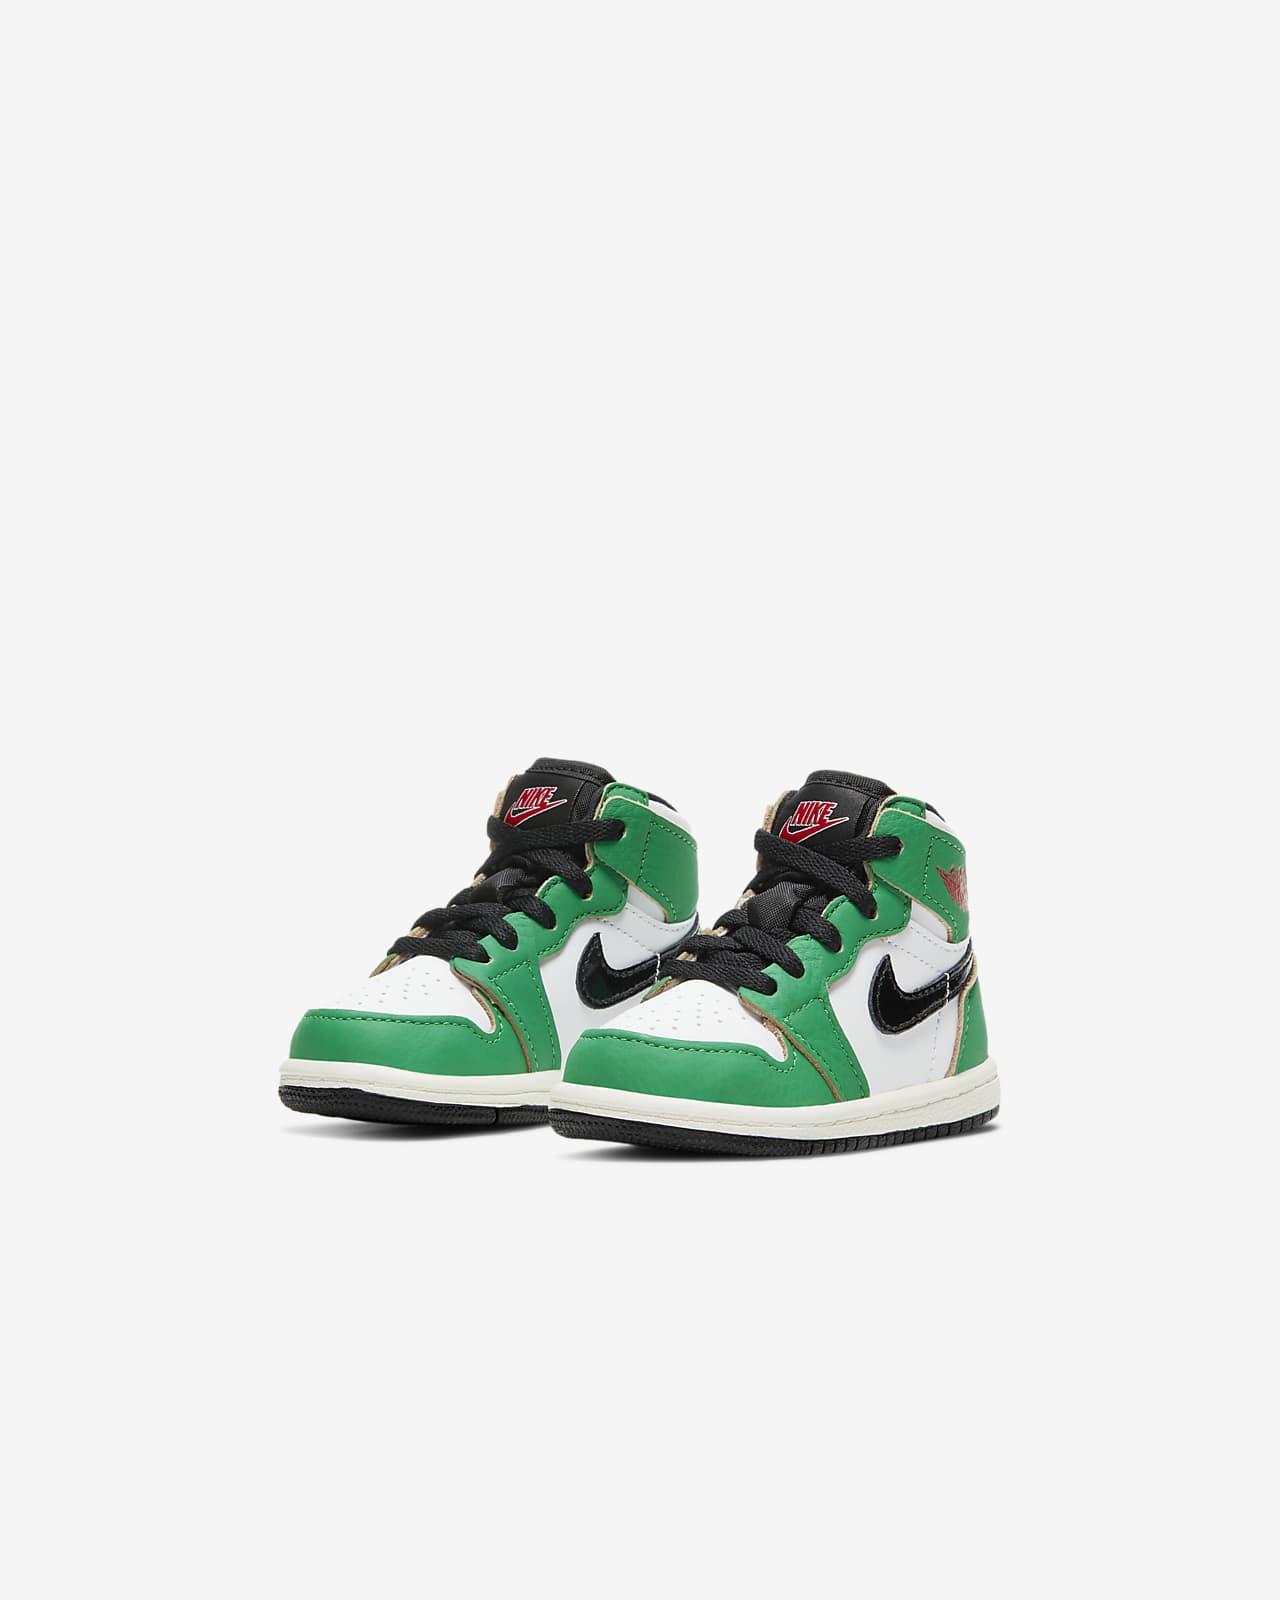 Jordan 1 High OG Baby/Toddler Shoe